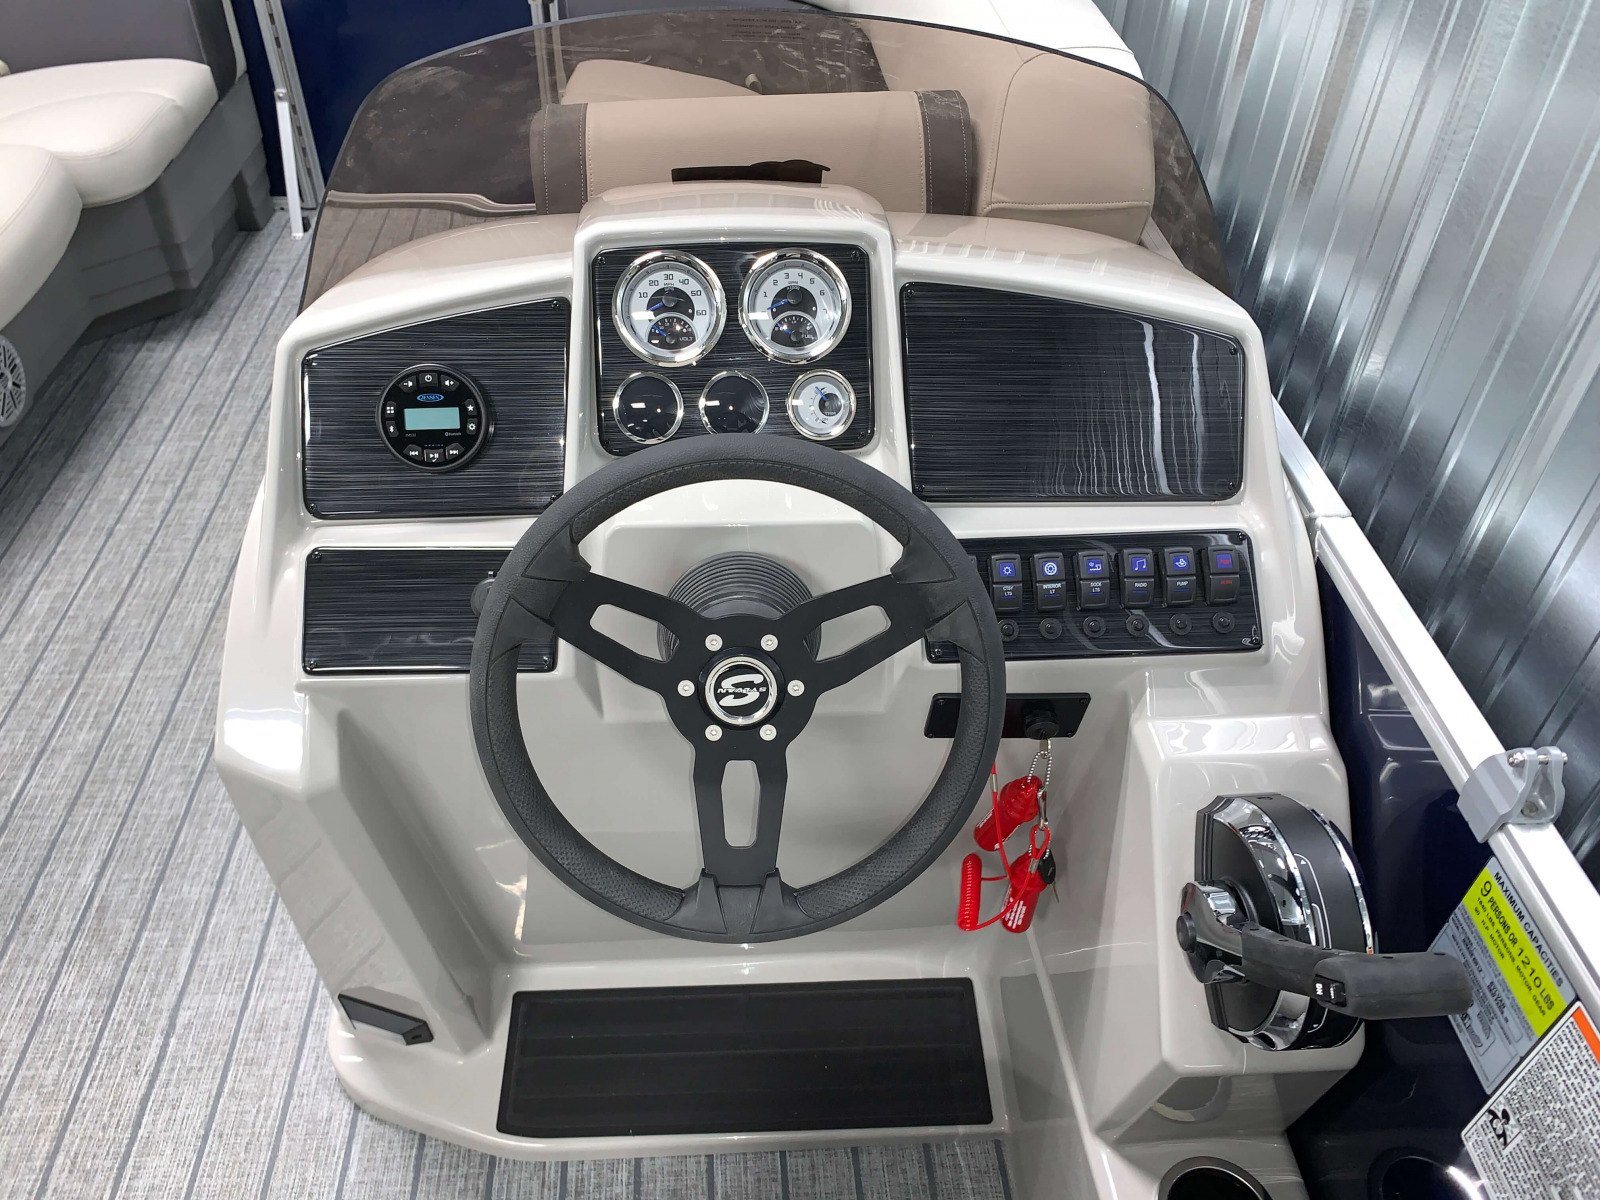 Helm of the 2021 Sylvan 820 LZ Pontoon Boat